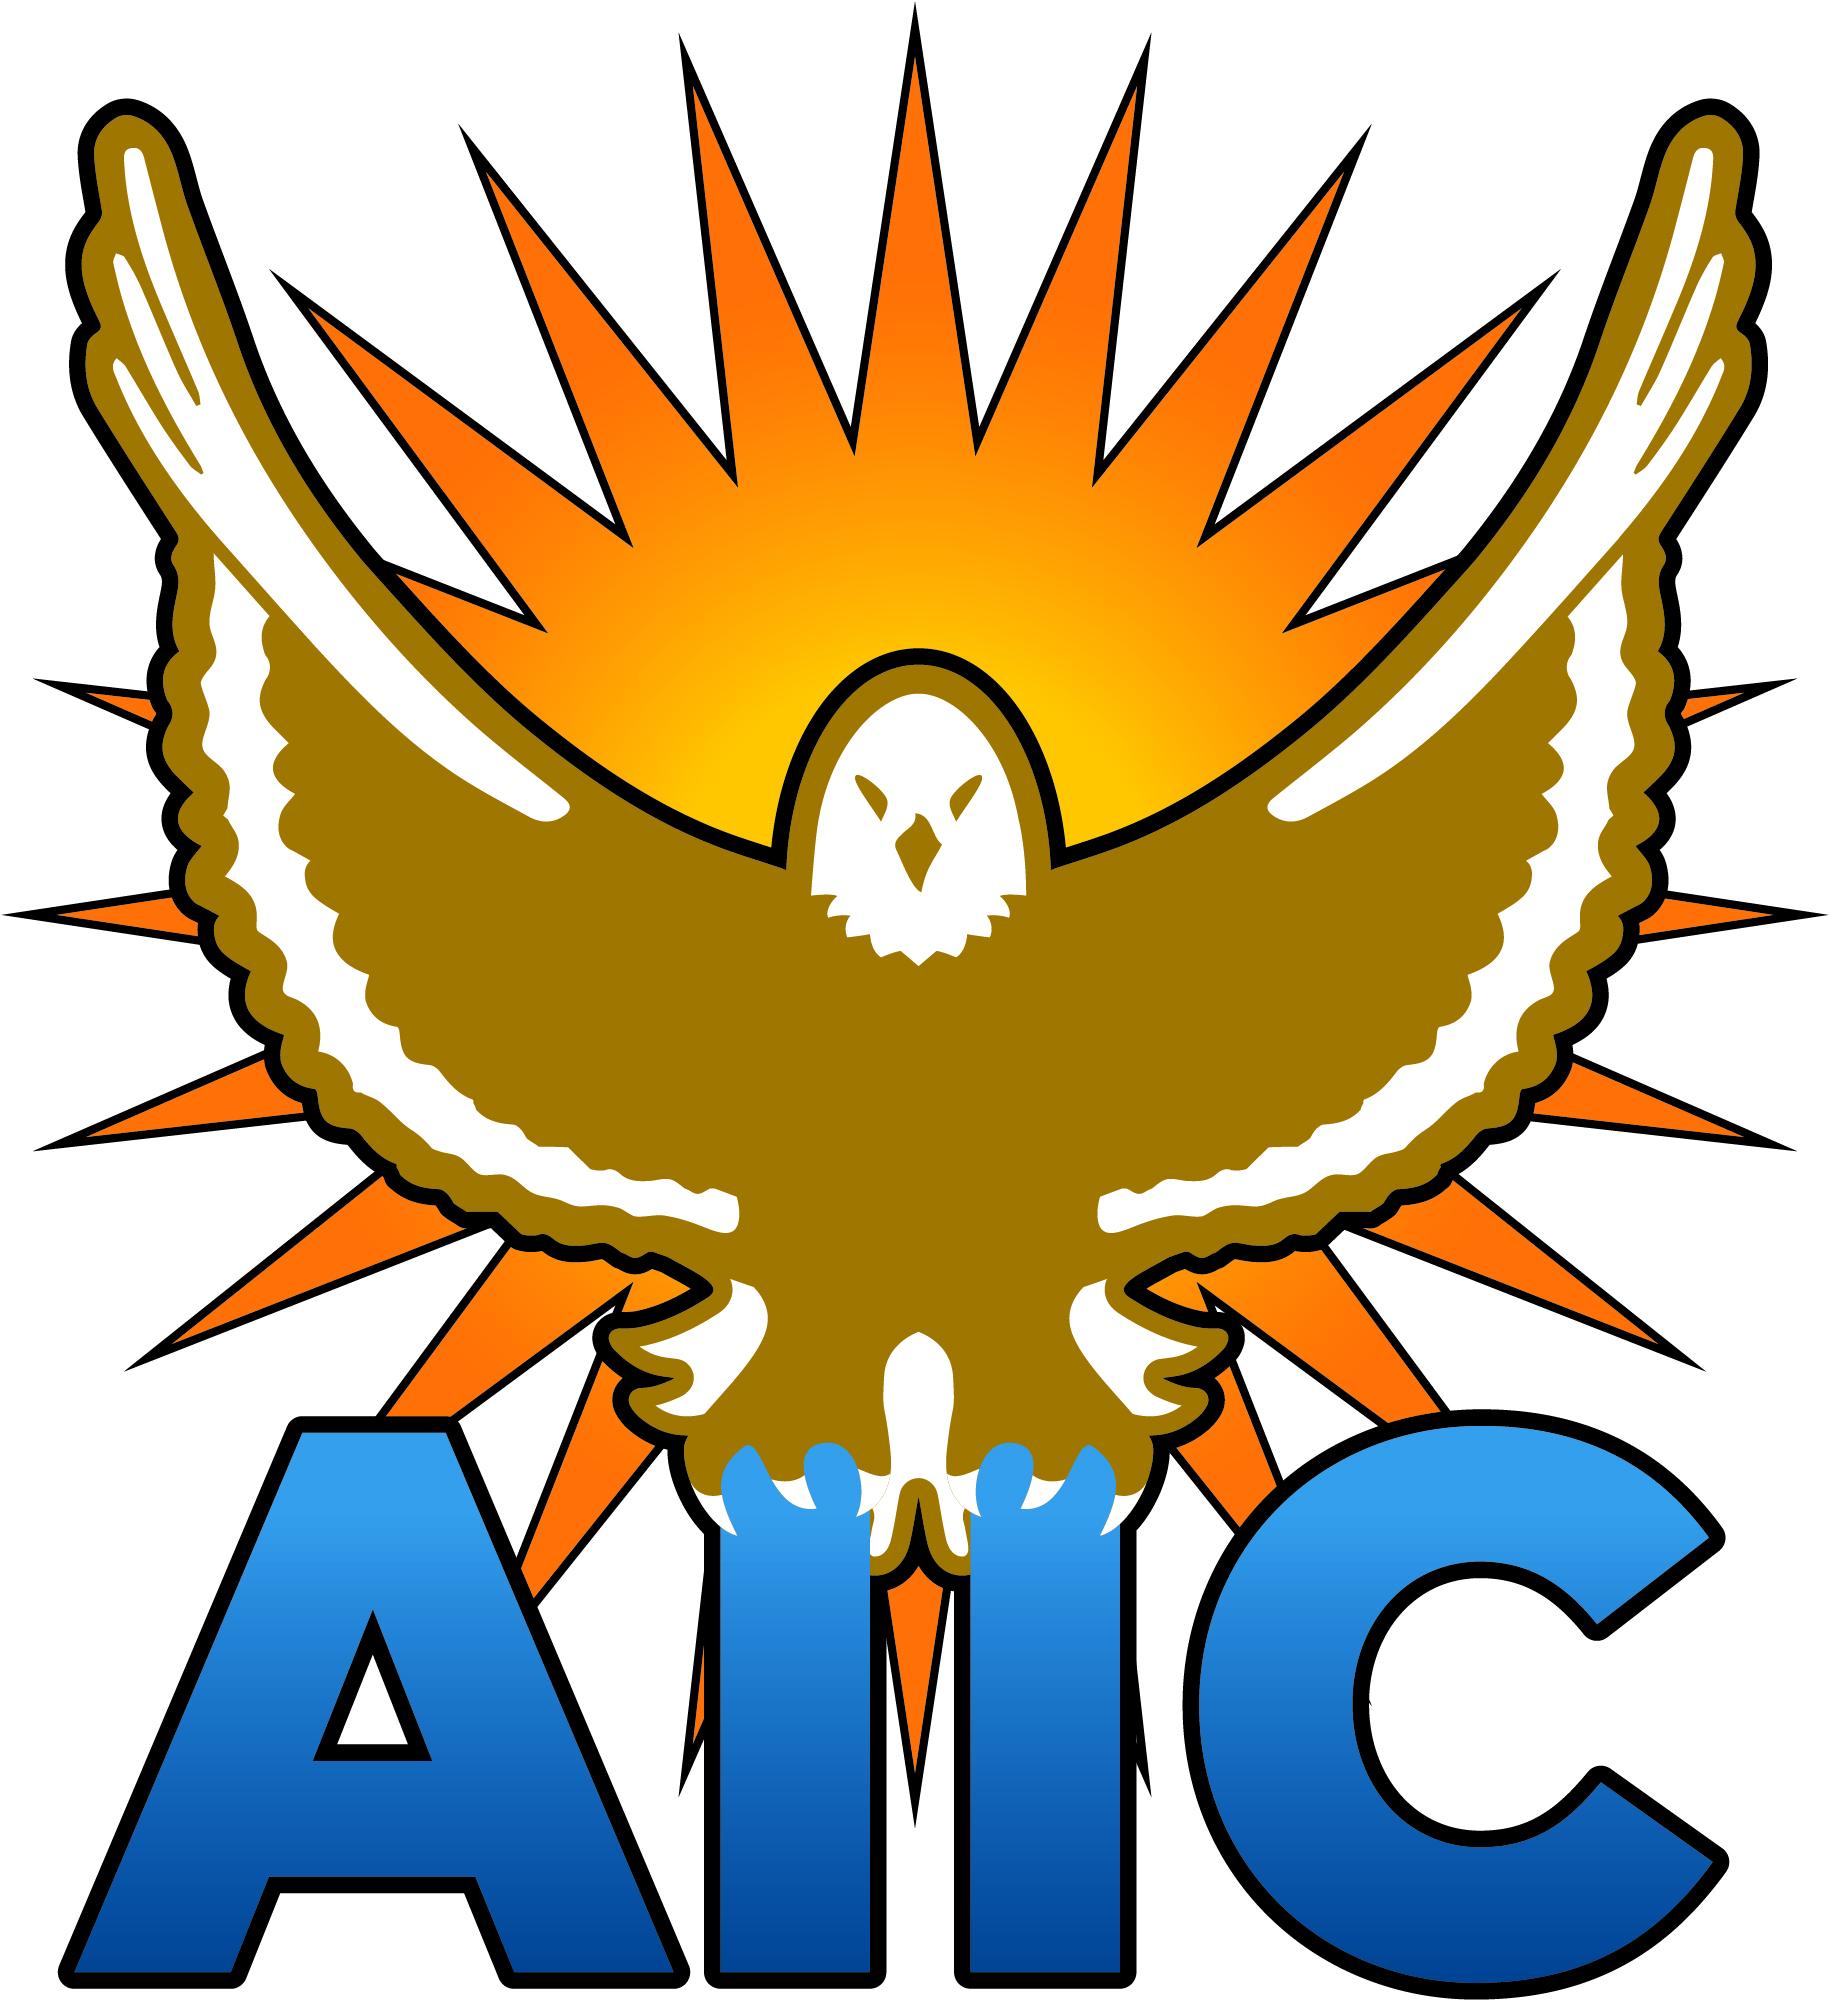 aiic_logo_jpg